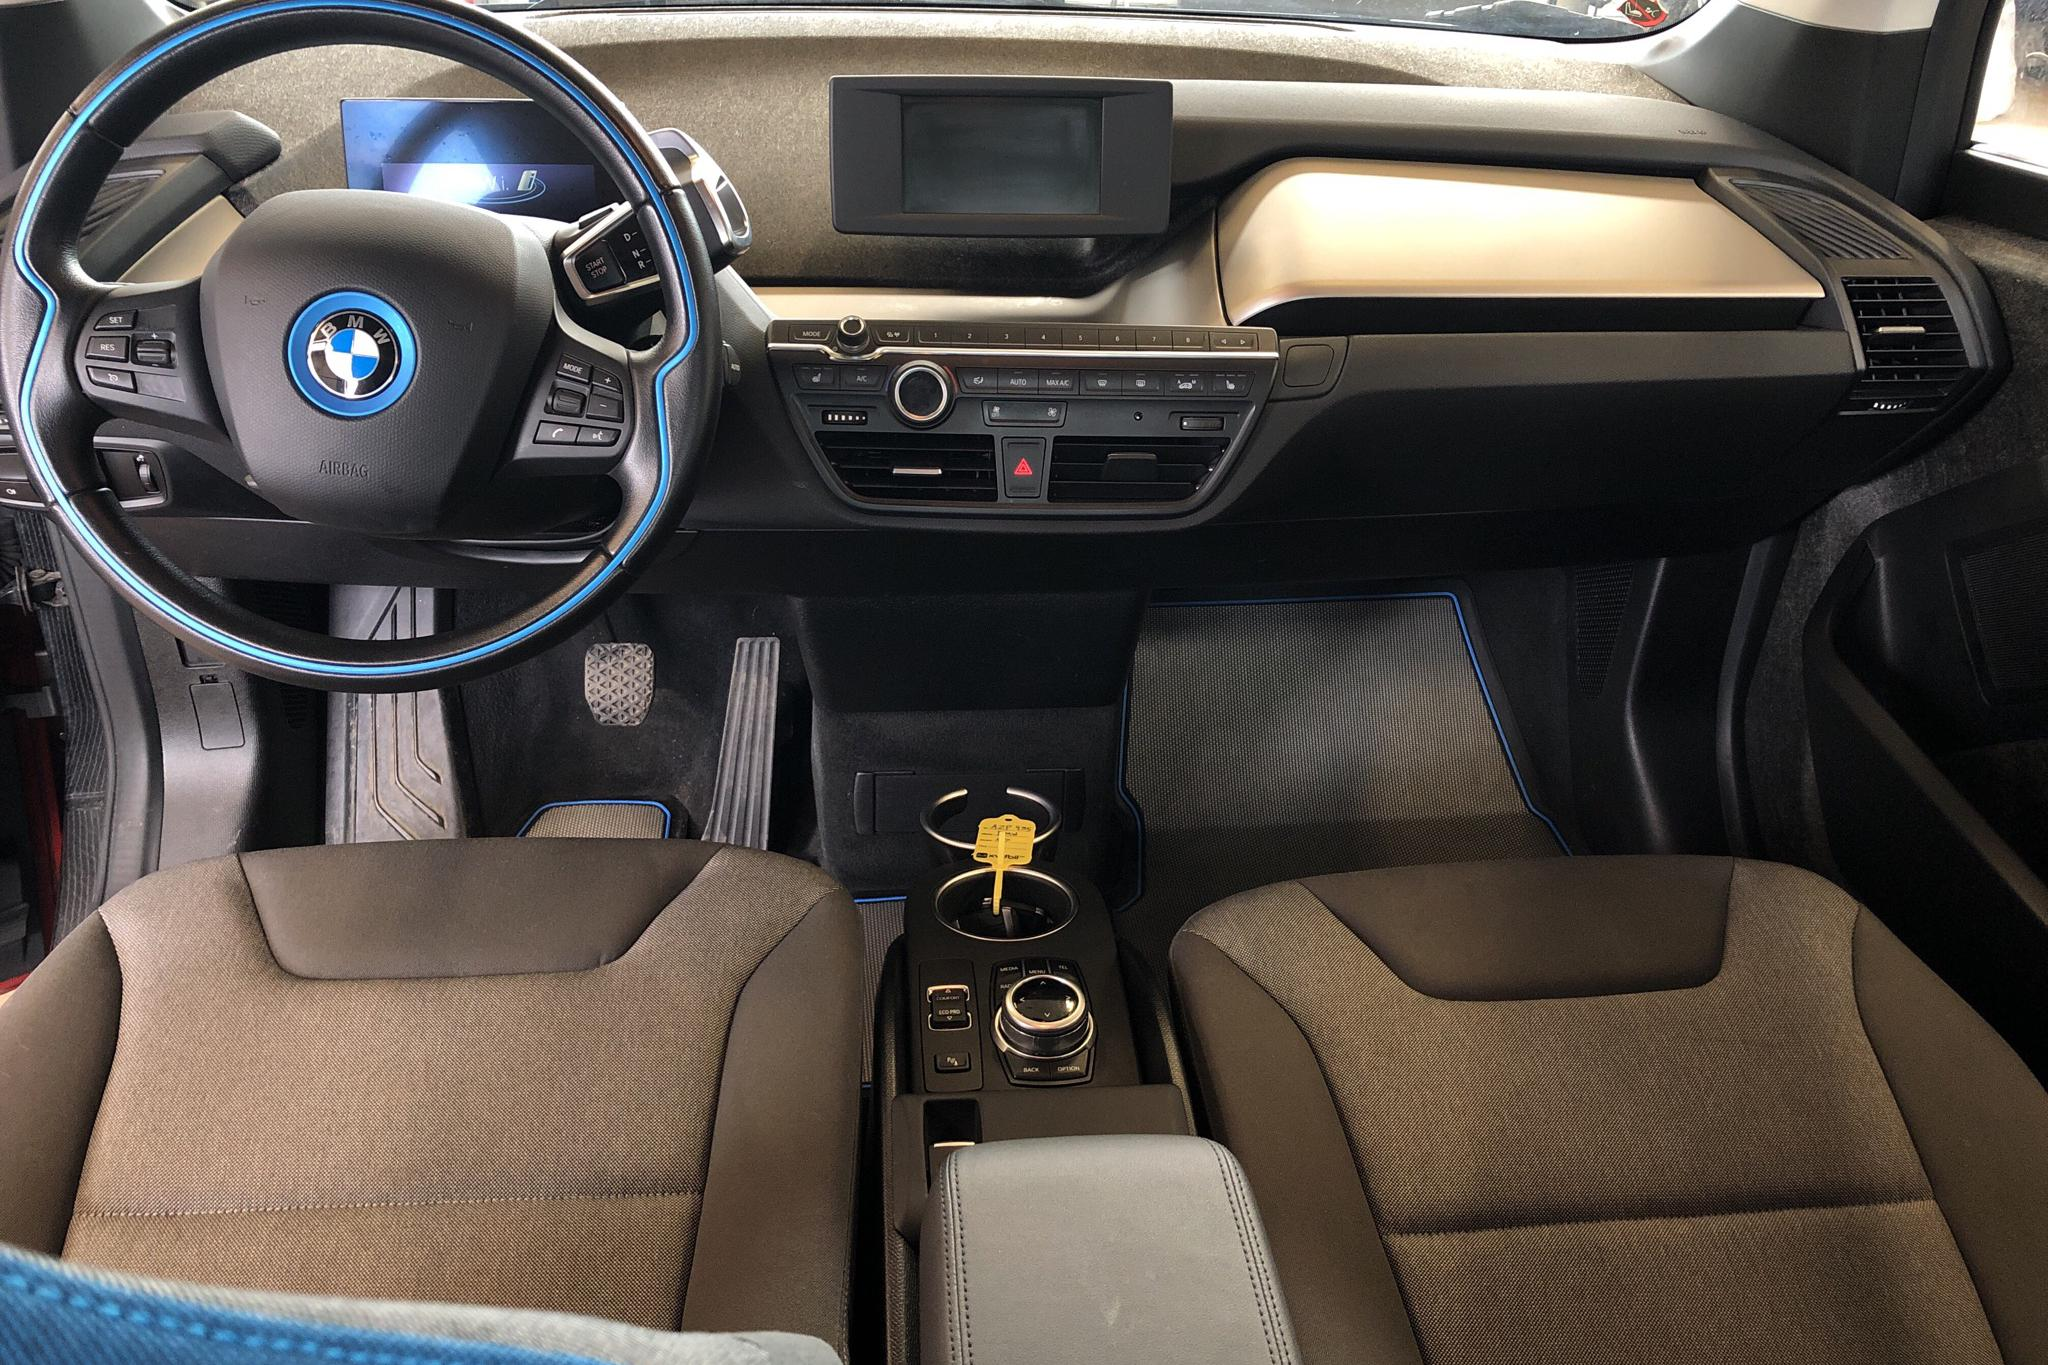 BMW i3 REX 94Ah, I01 (170hk) - 51 270 km - Automatic - red - 2018